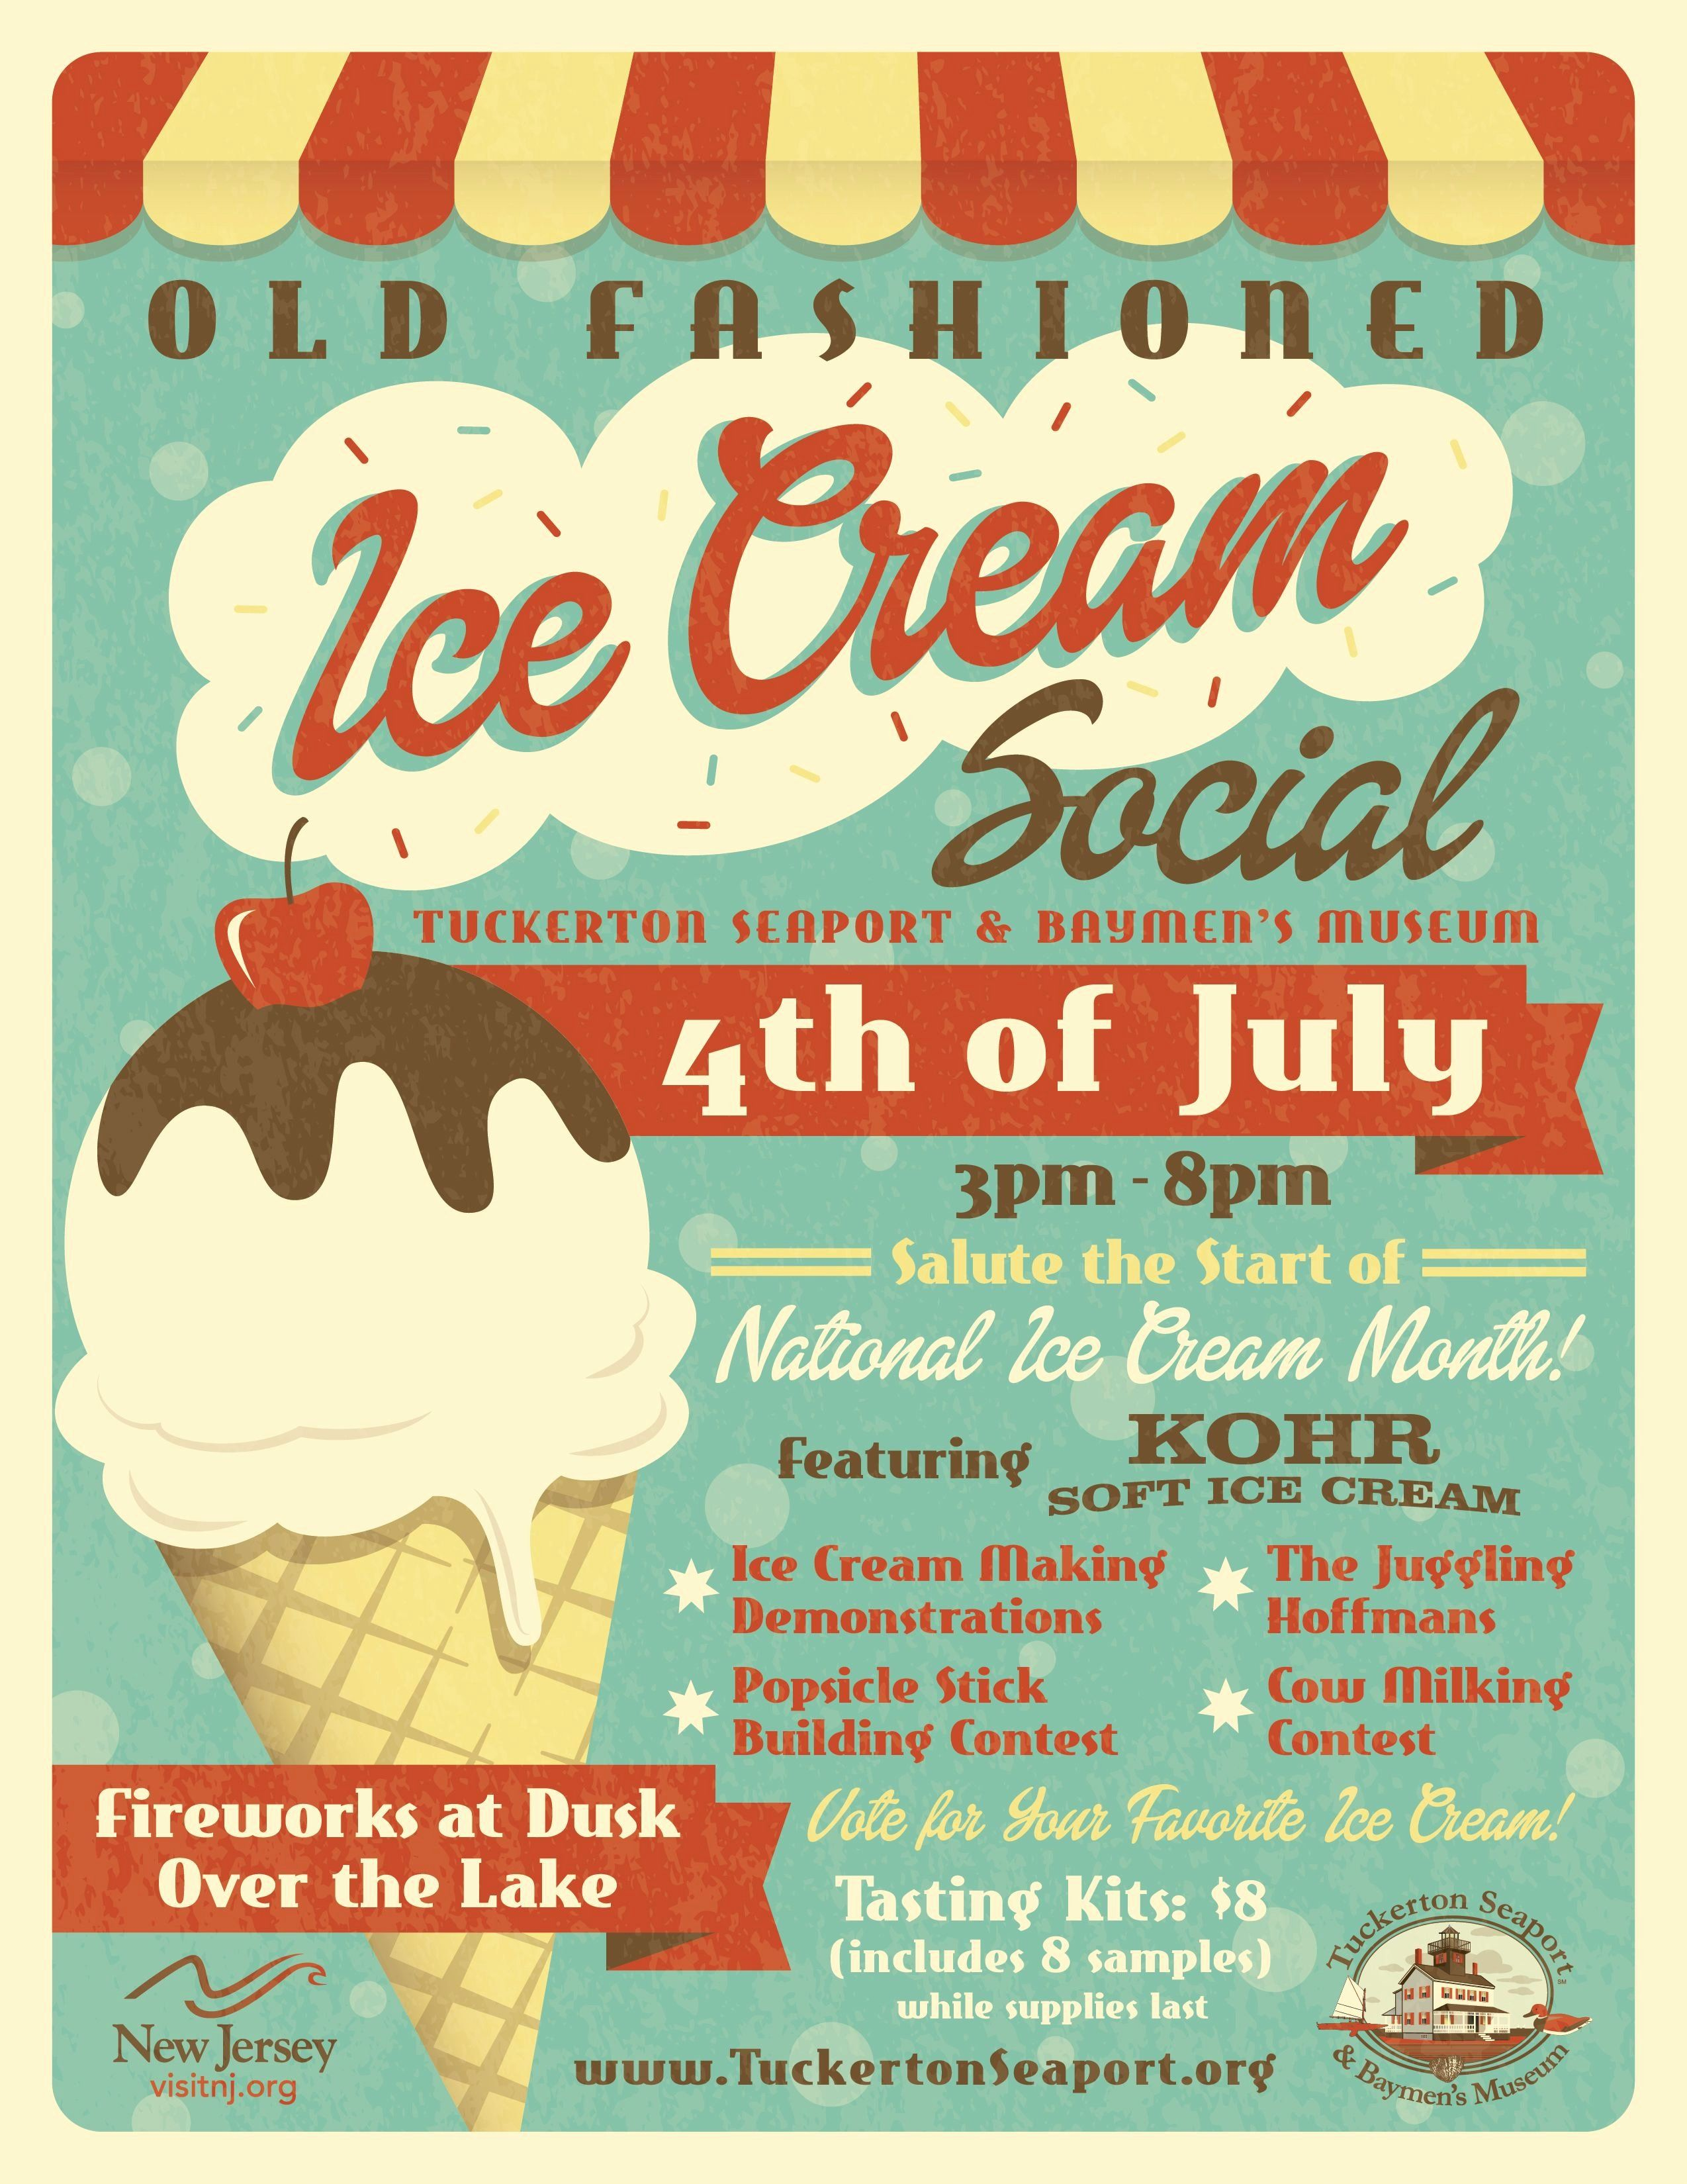 Ice Cream Social Flyer Template Lovely Designs Flyers Ice Cream Shop Google Search Ice Cream Social Ice Cream Poster Ice Cream Shop